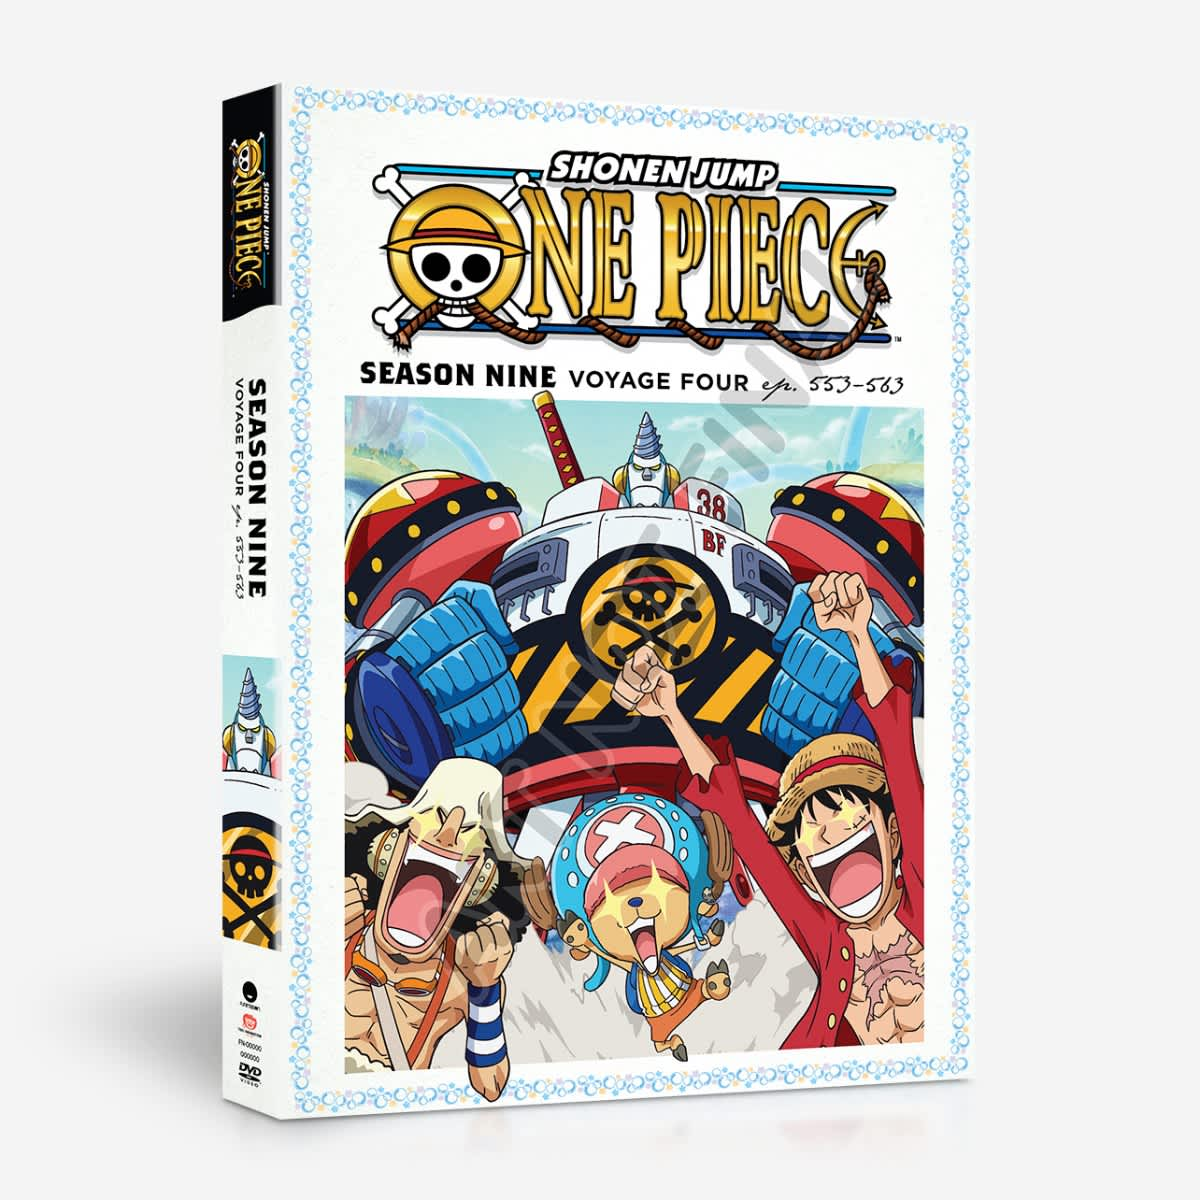 Season Nine, Voyage Four - DVD home-video